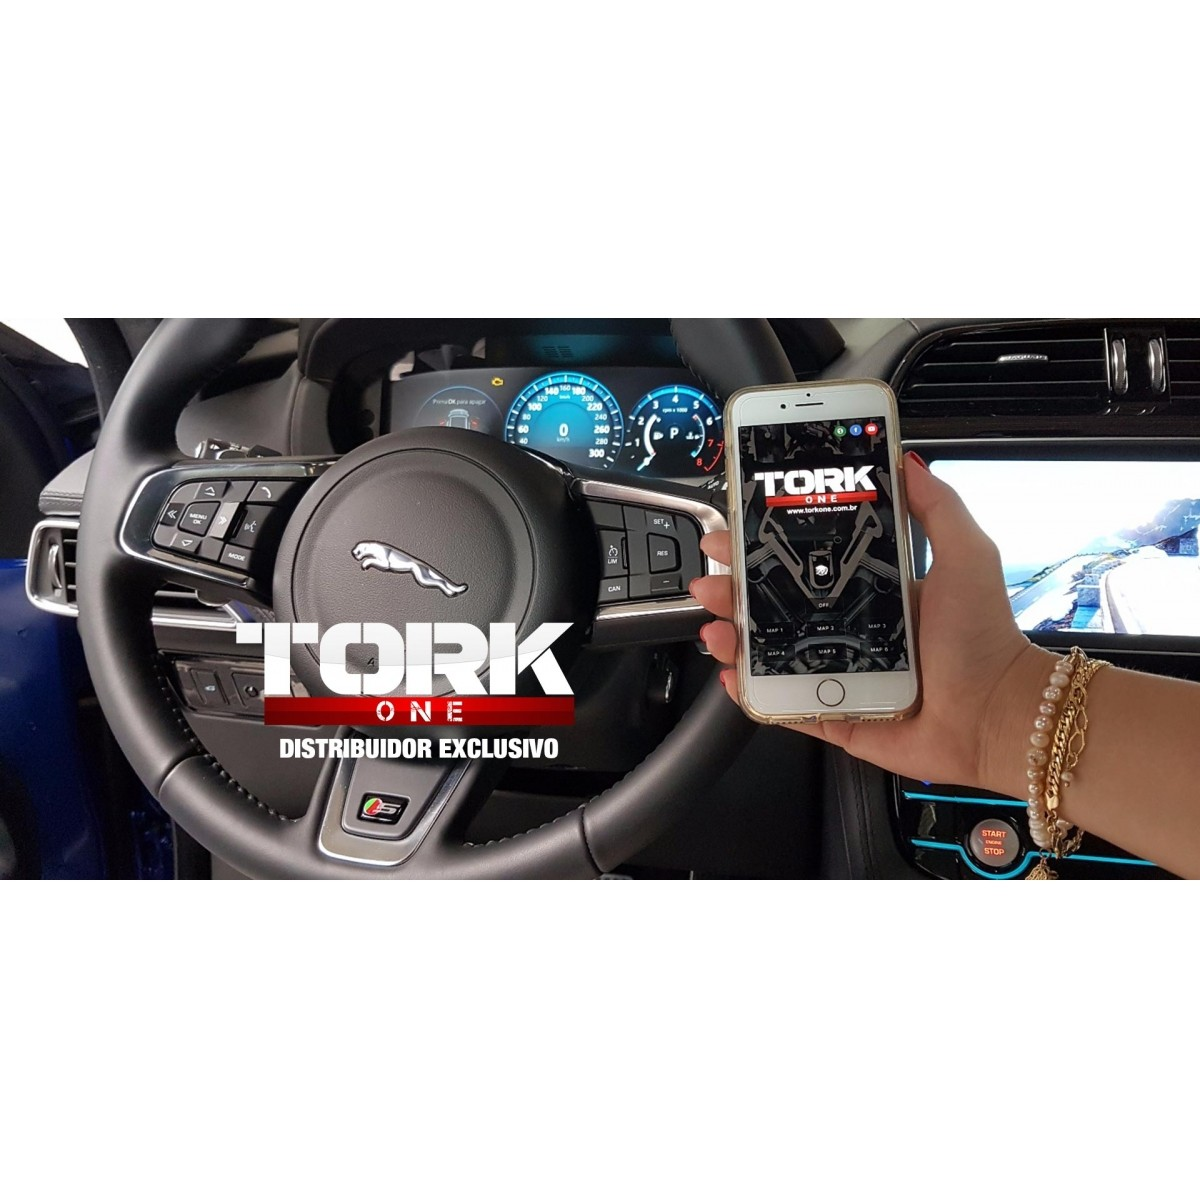 Gás Pedal - Chery - Tork One c/s Bluetooth